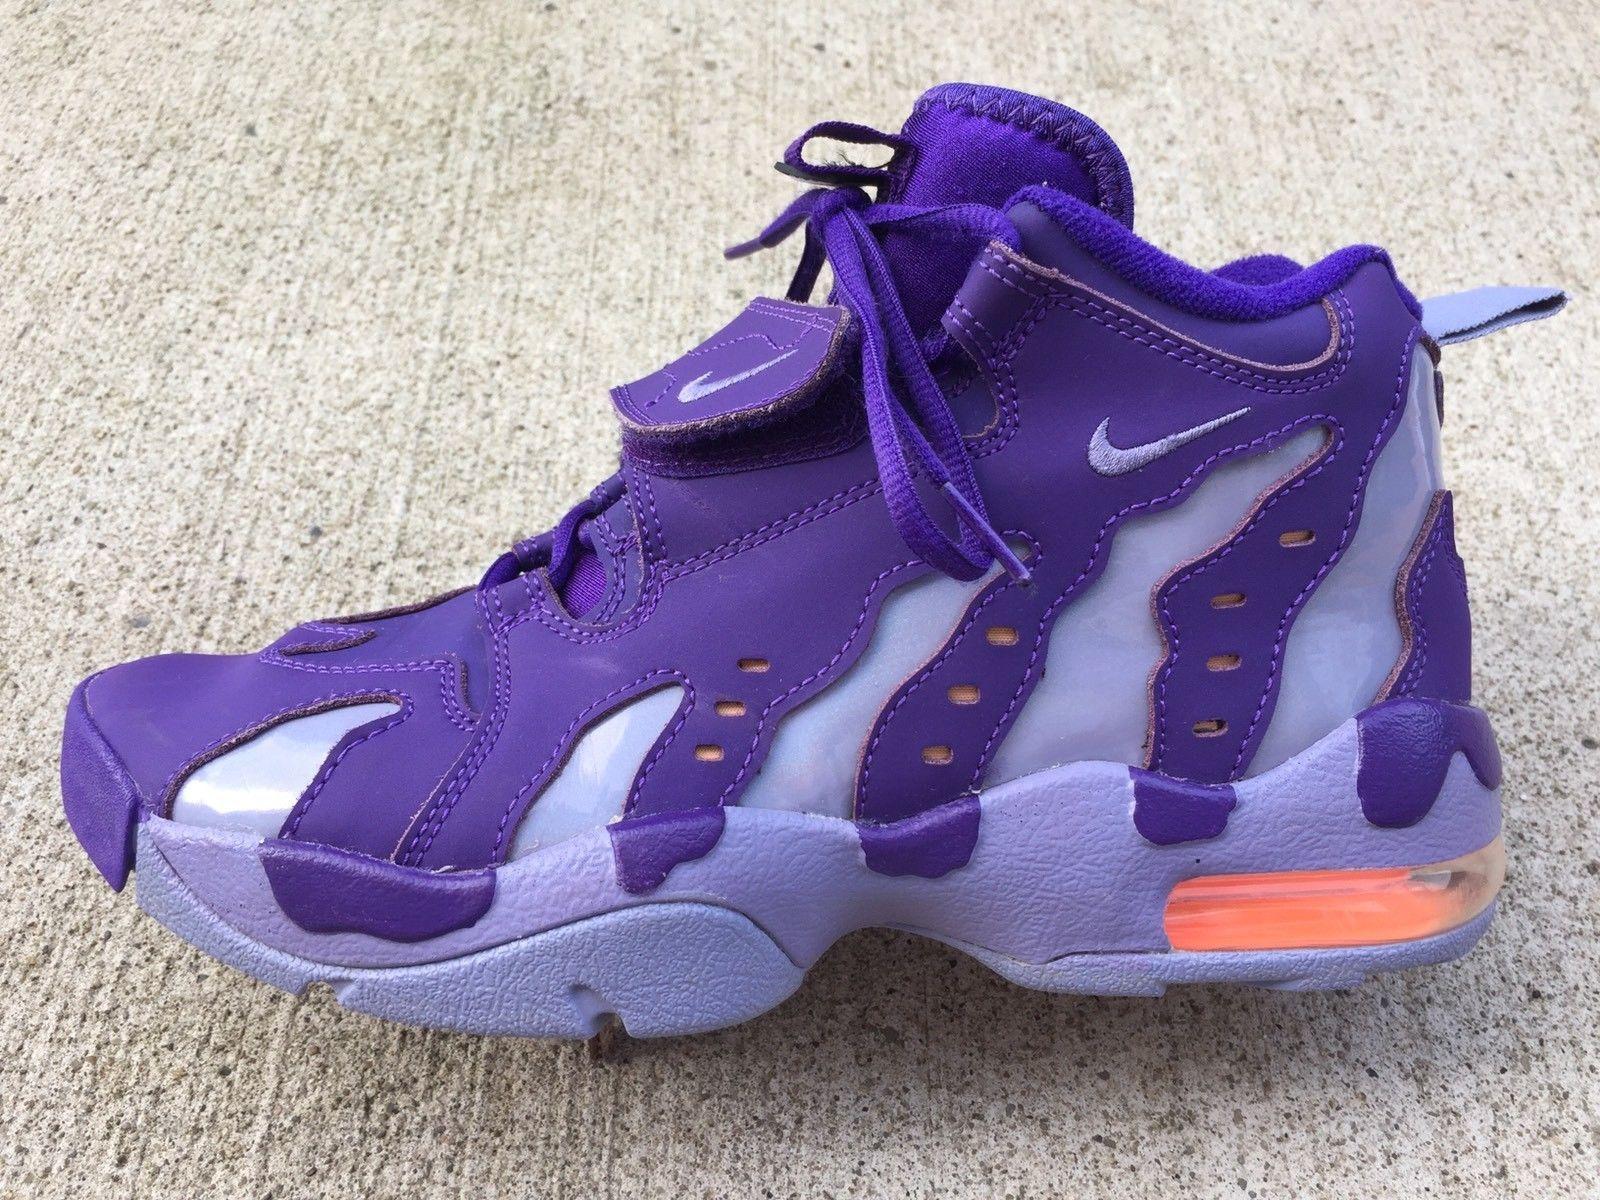 b07597628e NIKE AIR DIAMOND TURF Youth Athletic Basketball Shoes Size 7Y Purple 616502- 500 | eBay